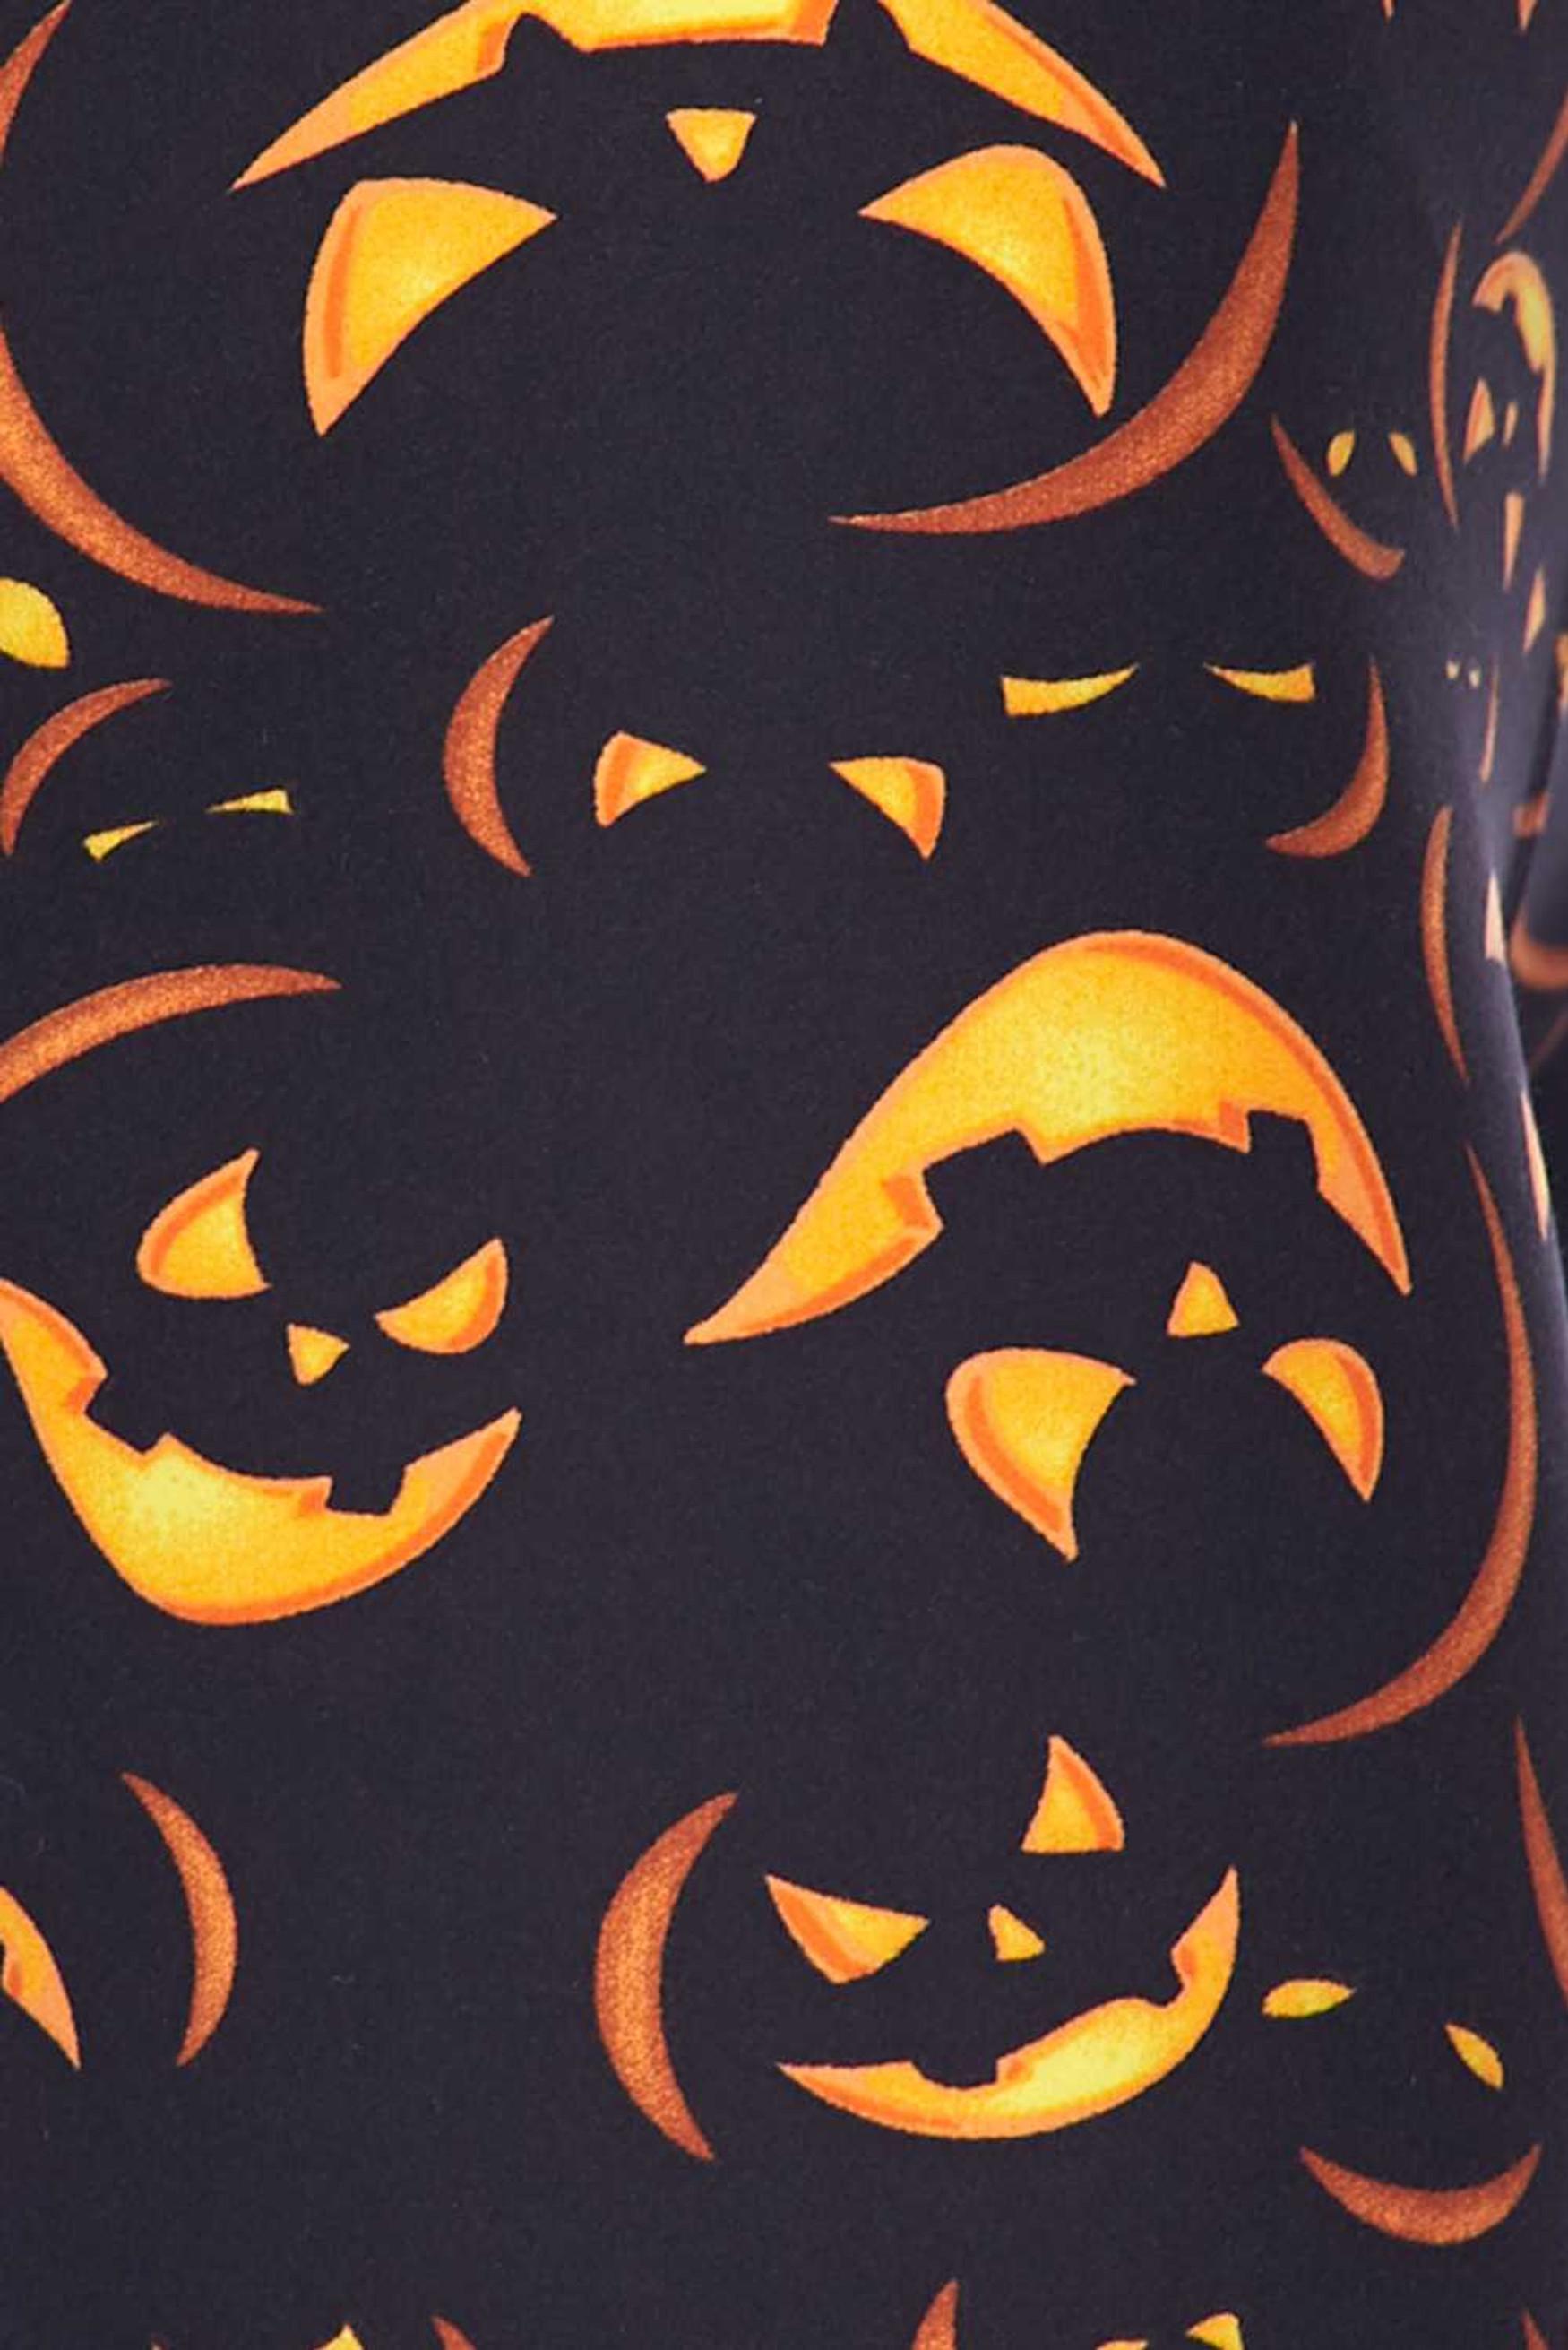 Buttery Soft Evil Halloween Pumpkins Kids Leggings - USA Fashion™